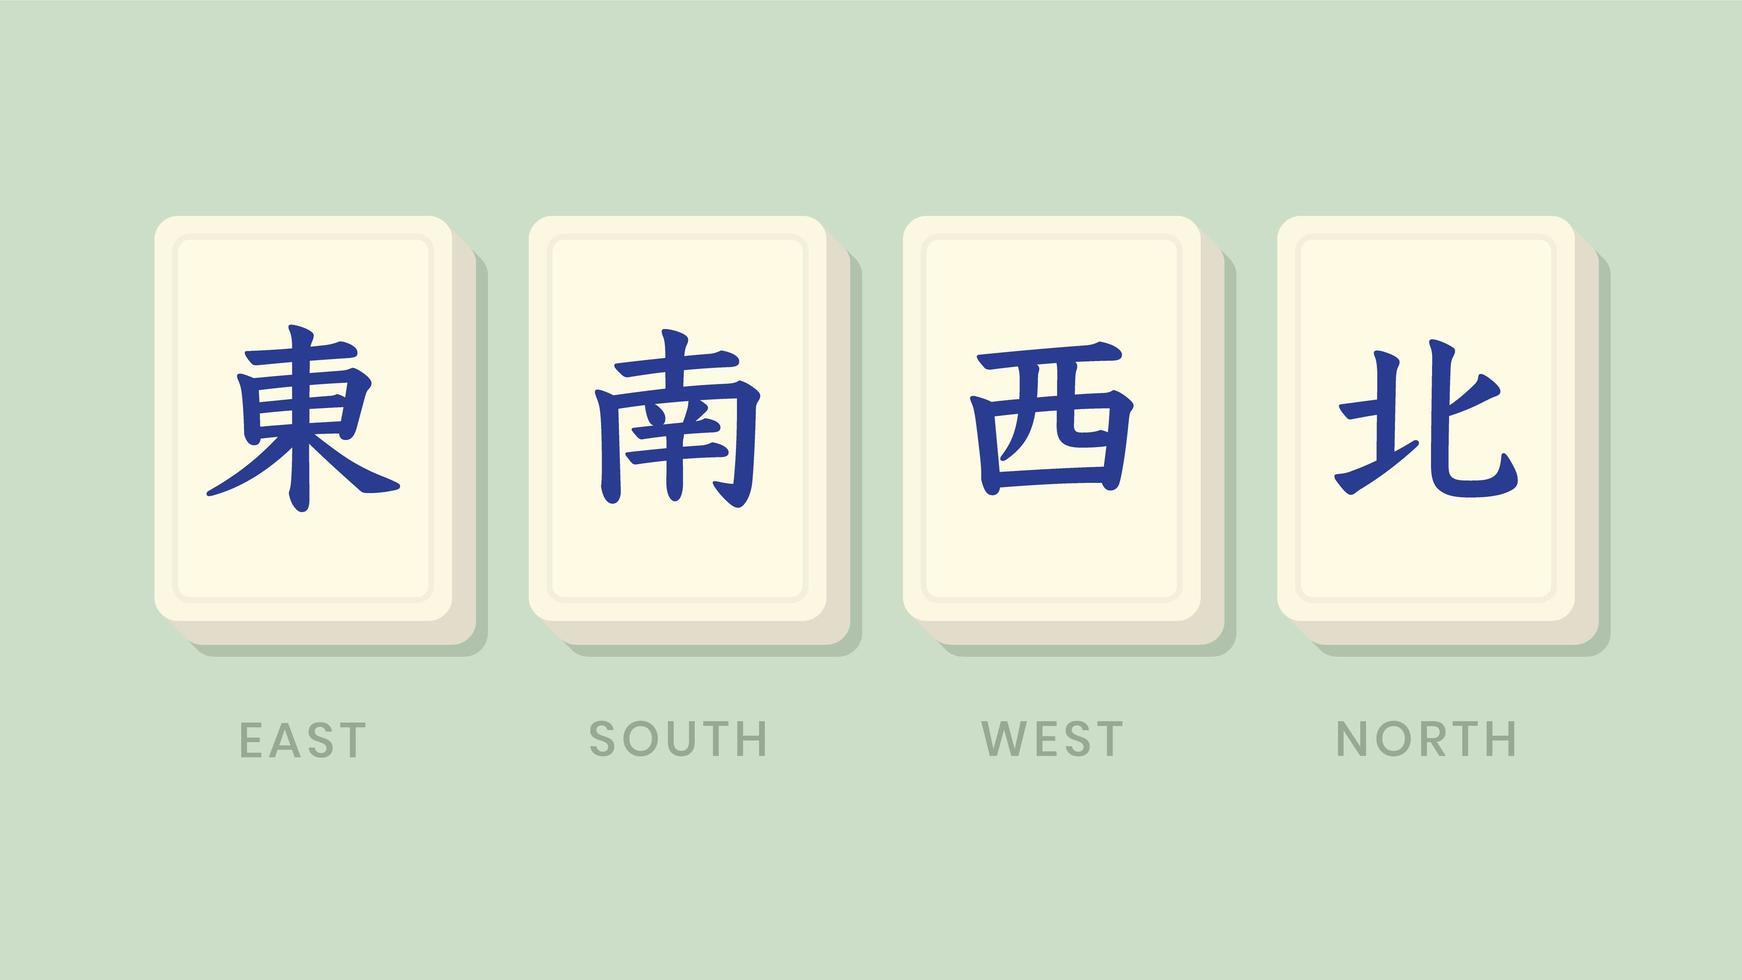 mahjong honore les tuiles vents vecteur